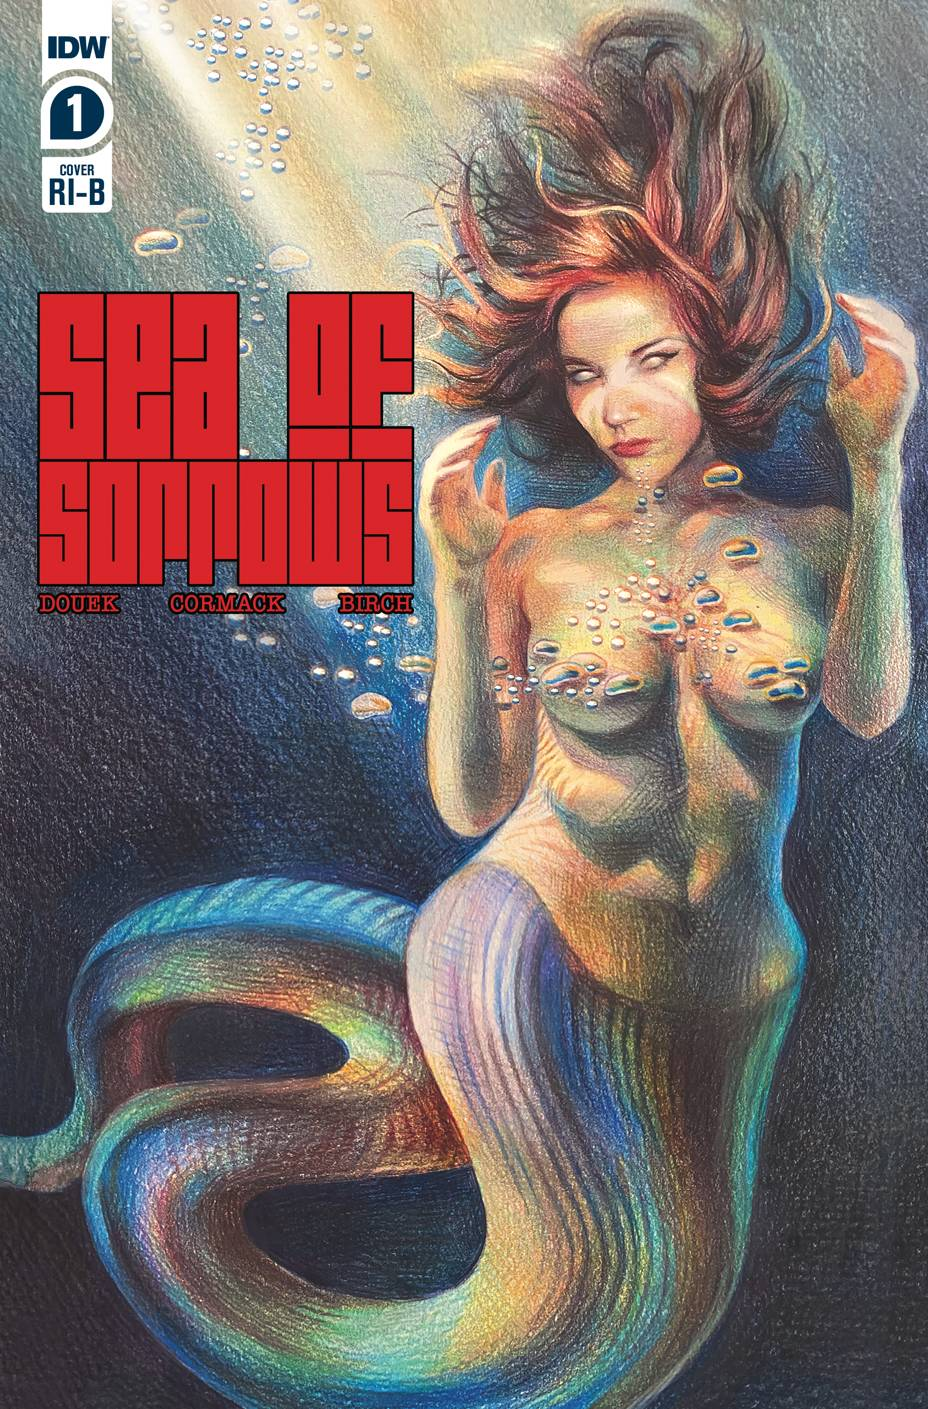 SEA OF SORROWS #1 (OF 5) 25 COPY INCV ERICA ROSE LEVINE (NET